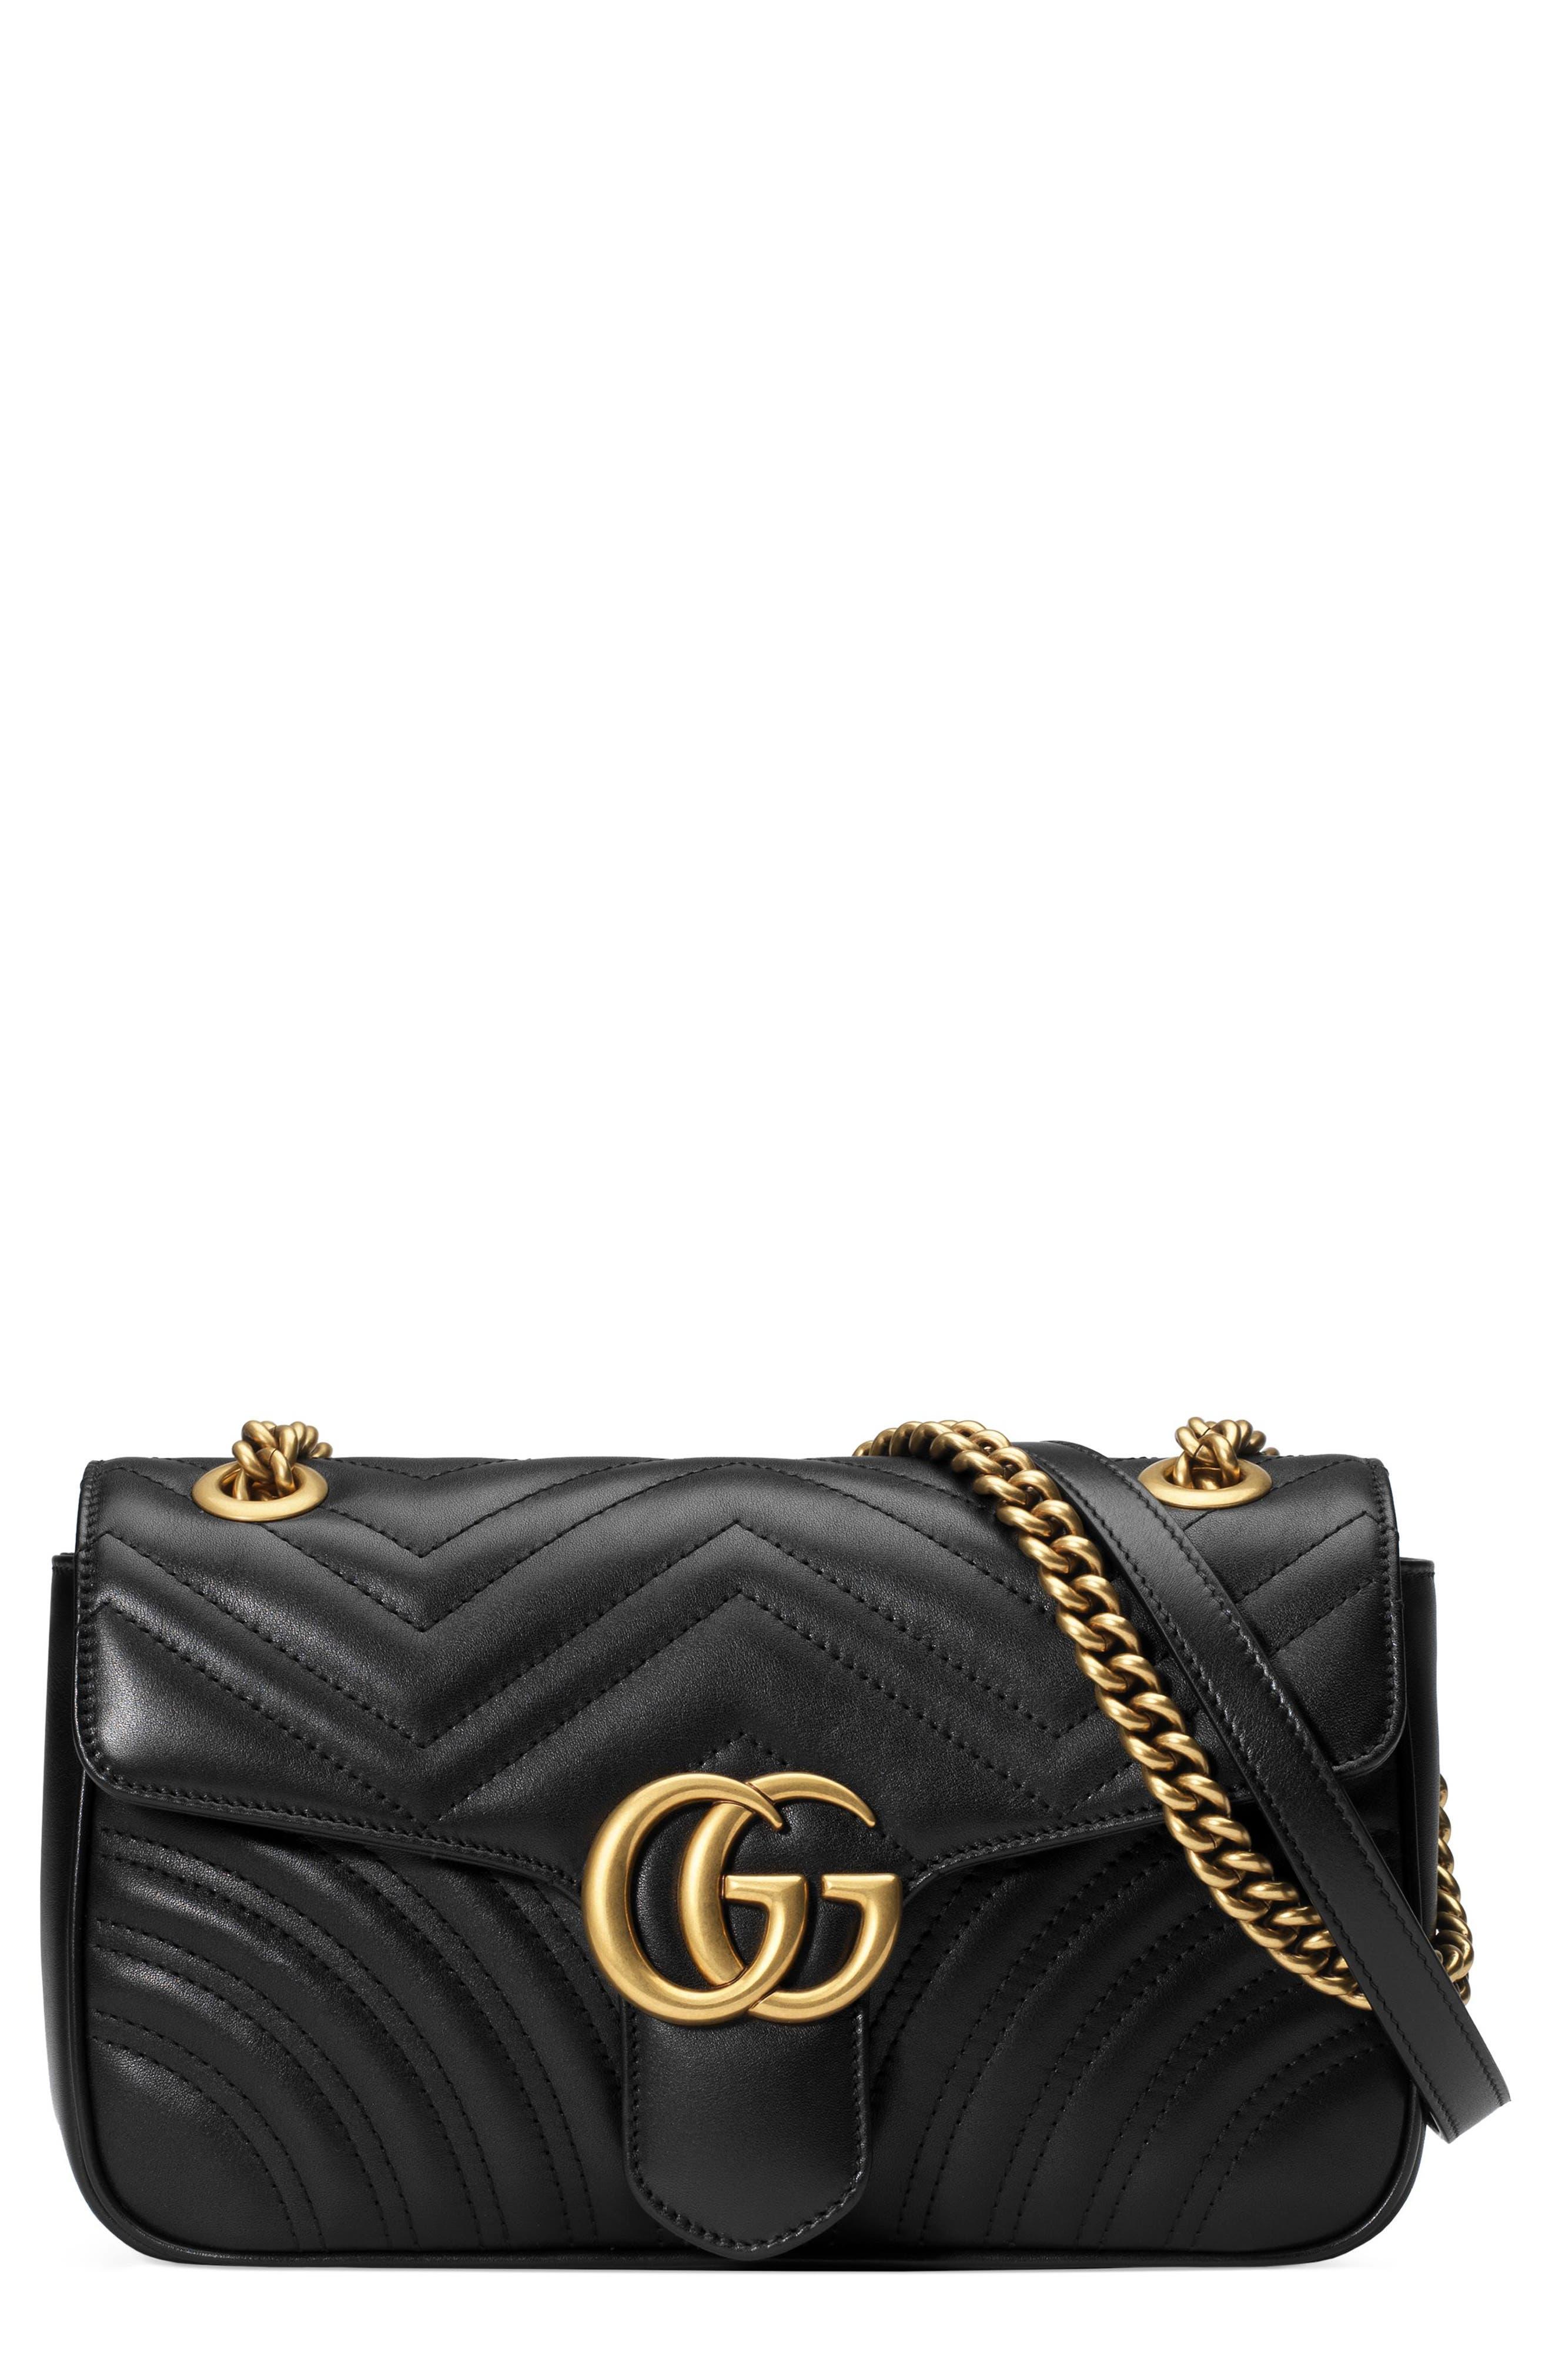 Small GG Marmont 2.0 Matelassé Leather Shoulder Bag,                             Main thumbnail 1, color,                             NERO/ NERO